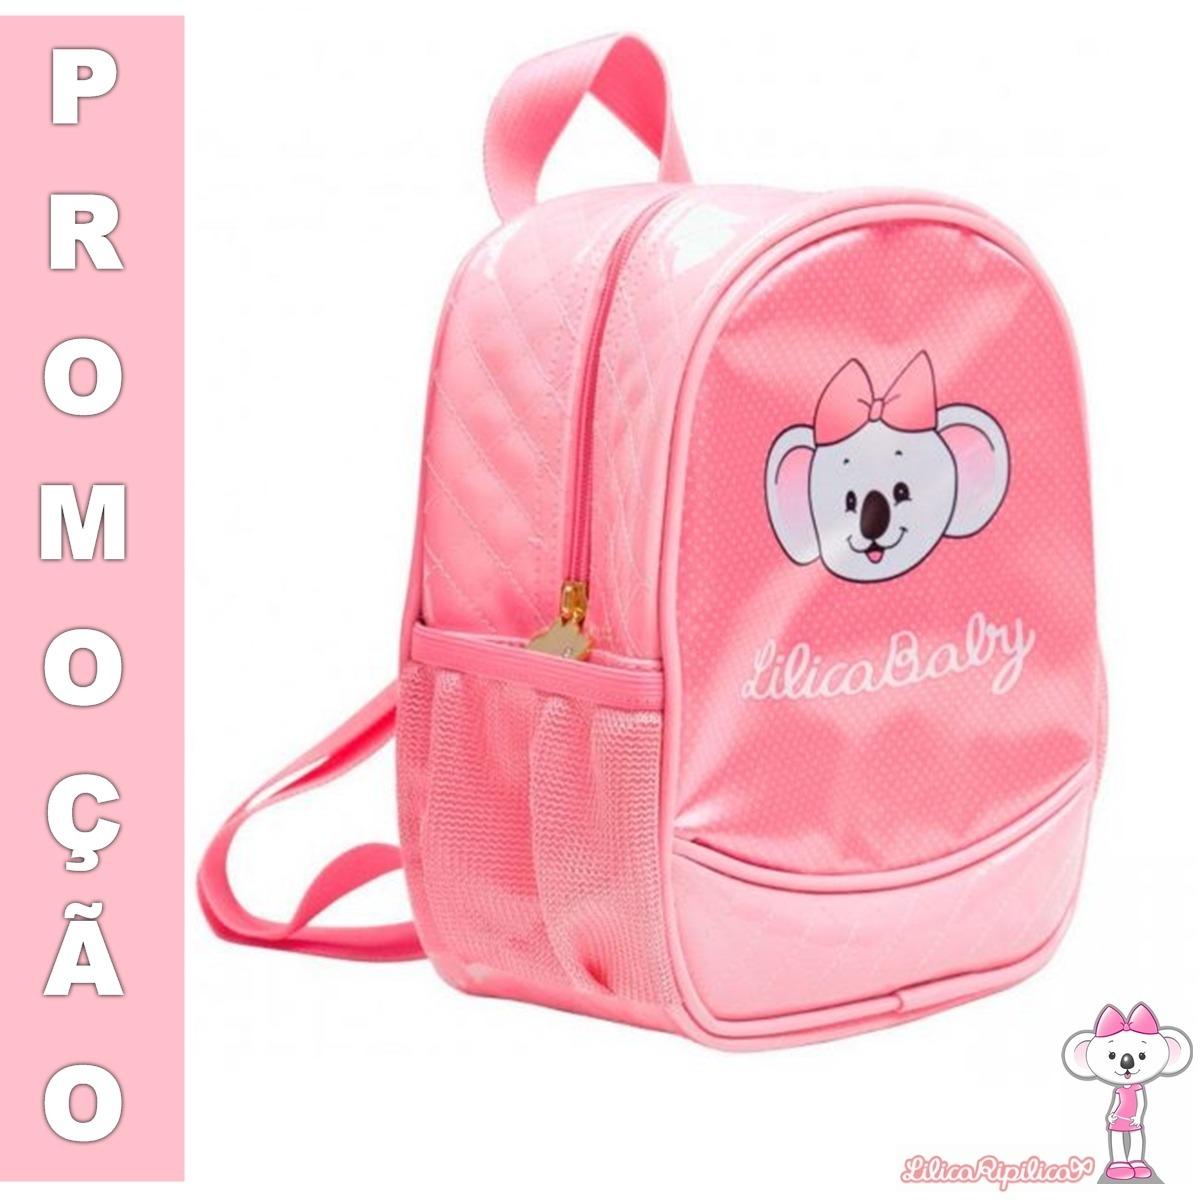 97d89ca180ac4 mochila bolsas malas infantil rosa lilica ripilica original,. Carregando  zoom.